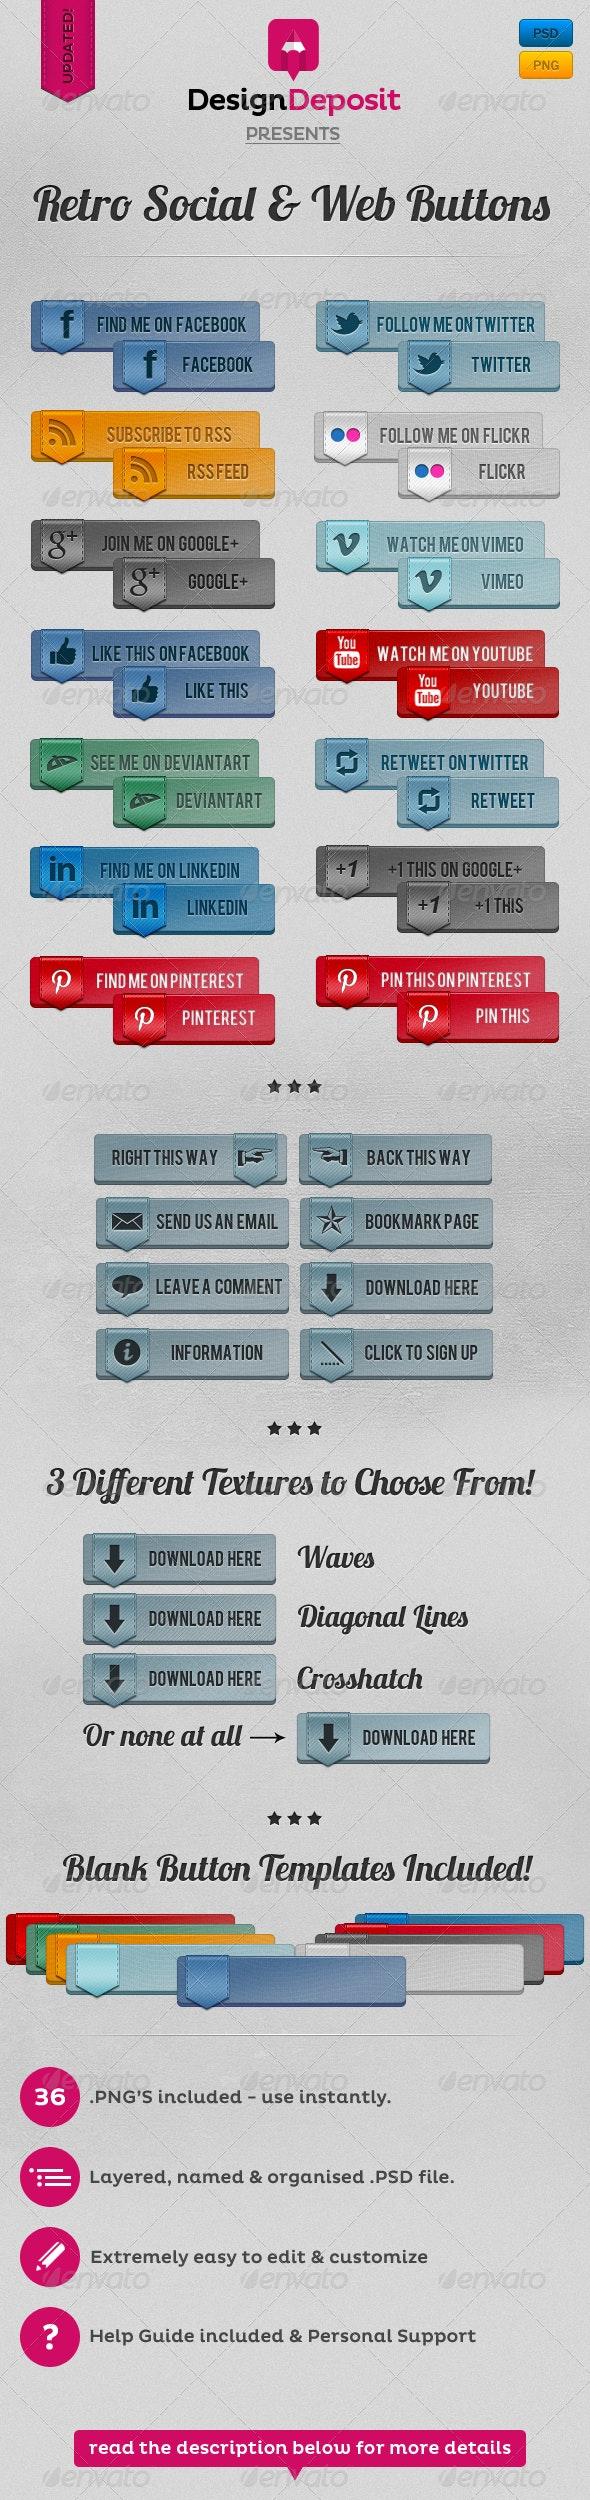 Retro Vintage Social and Web Buttons - Buttons Web Elements